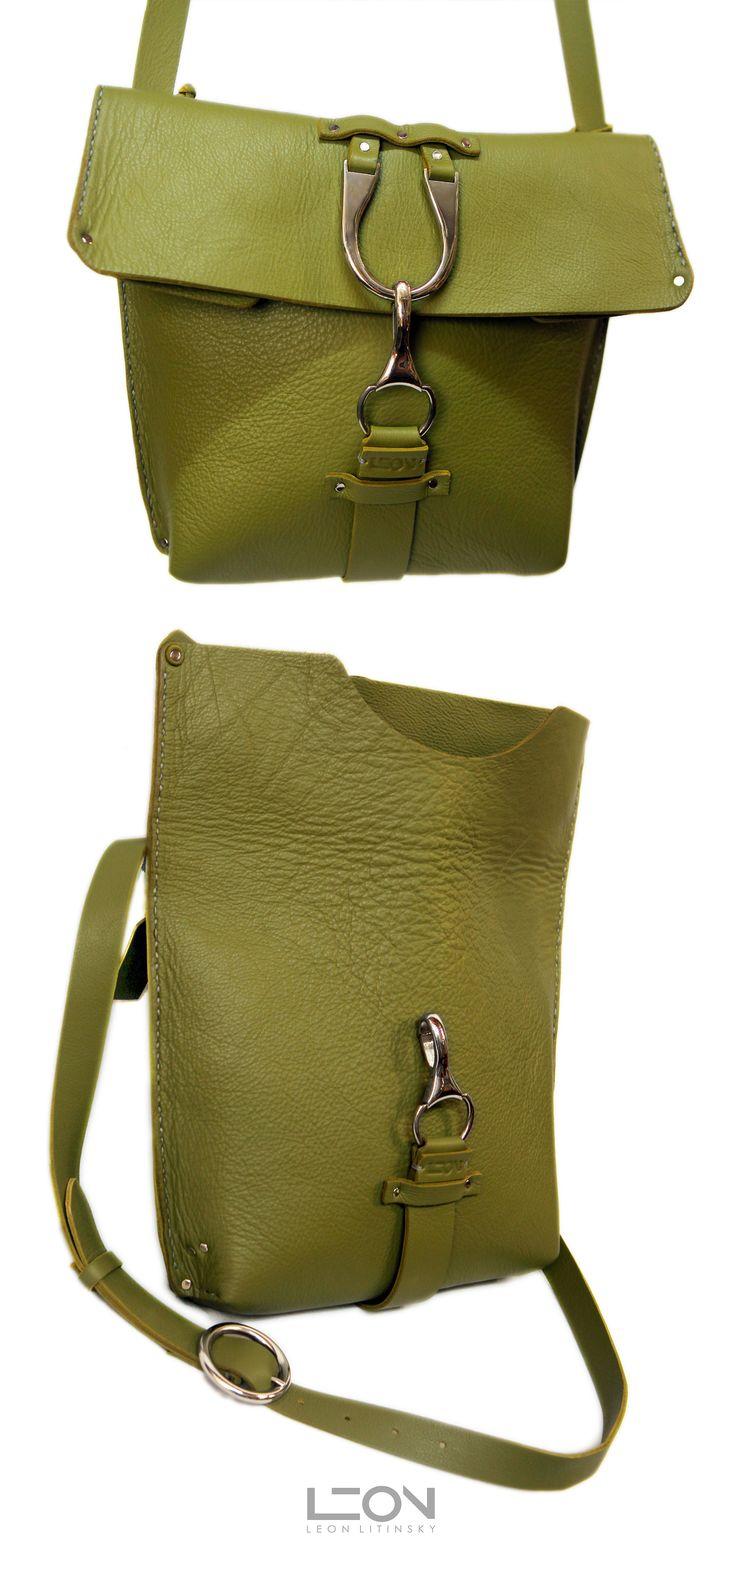 Green Leather Bag by Leon Litinsky Handmade Handbags & Accessories - http://amzn.to/2iLR27v